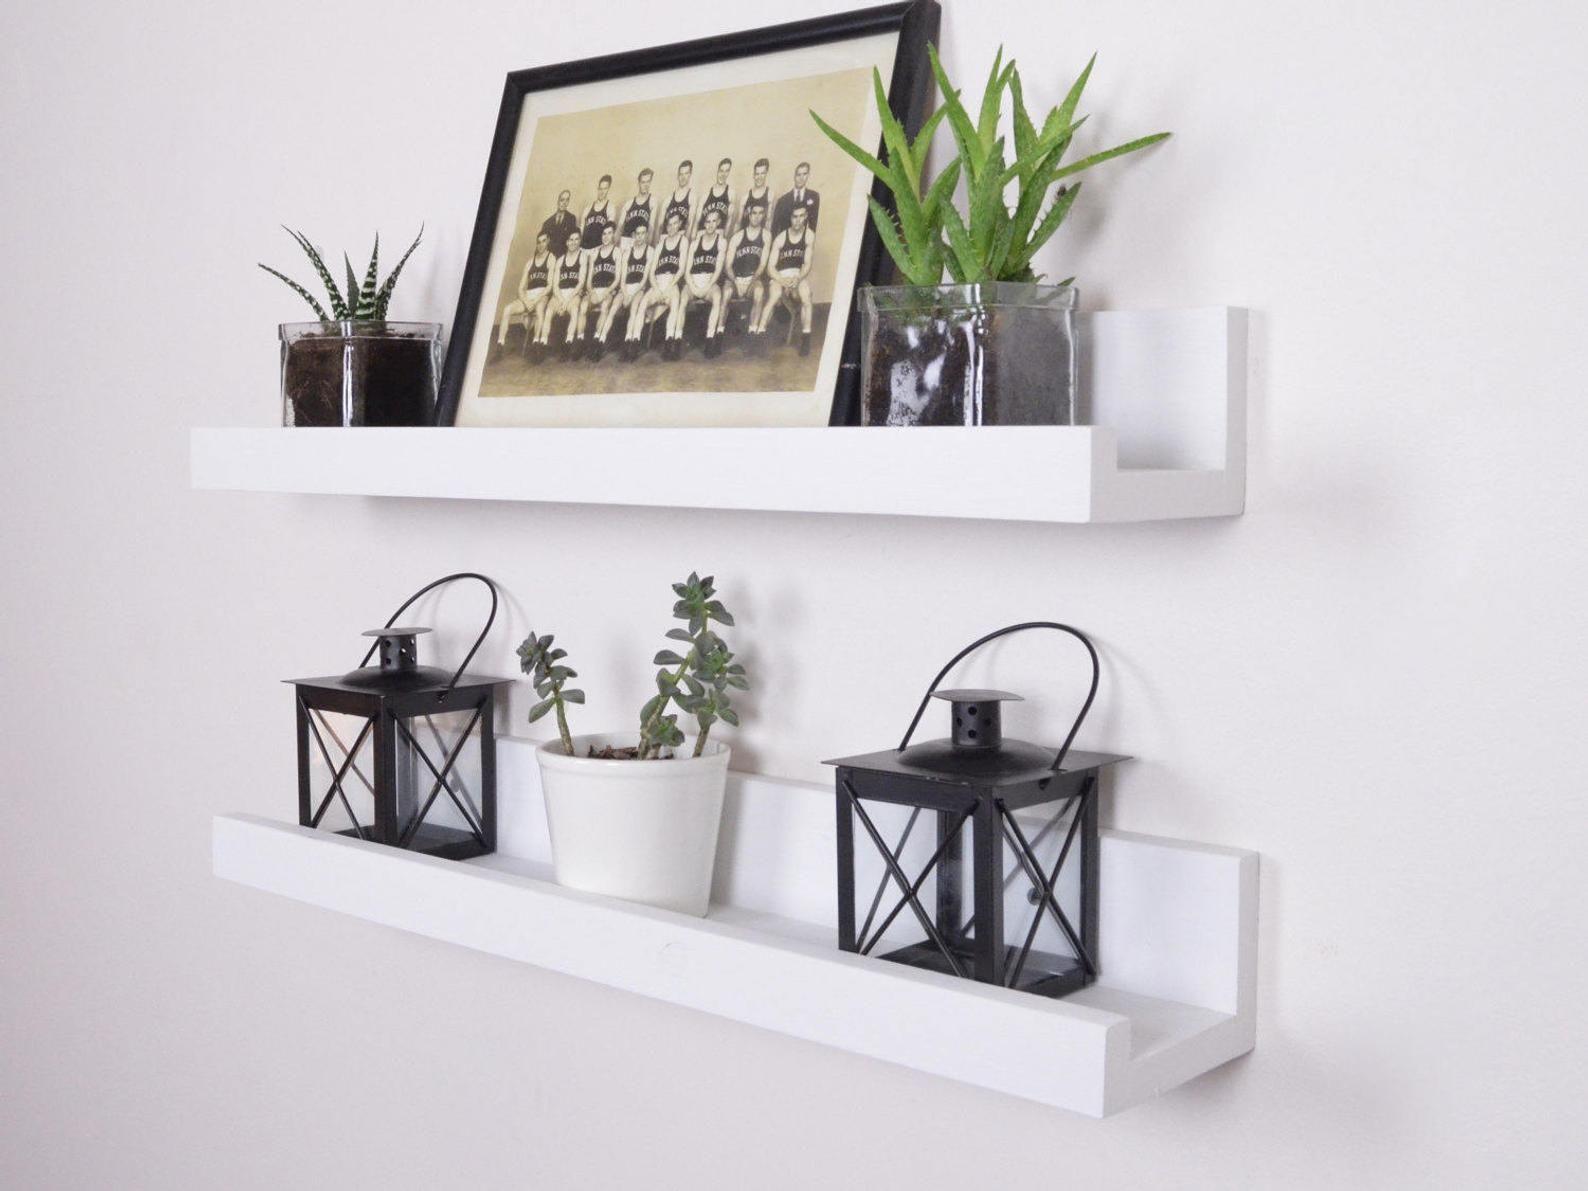 White Picture Ledge Free Shipping White Ledge Shelf Etsy In 2020 Ledge Shelf Floating Shelves Shelves